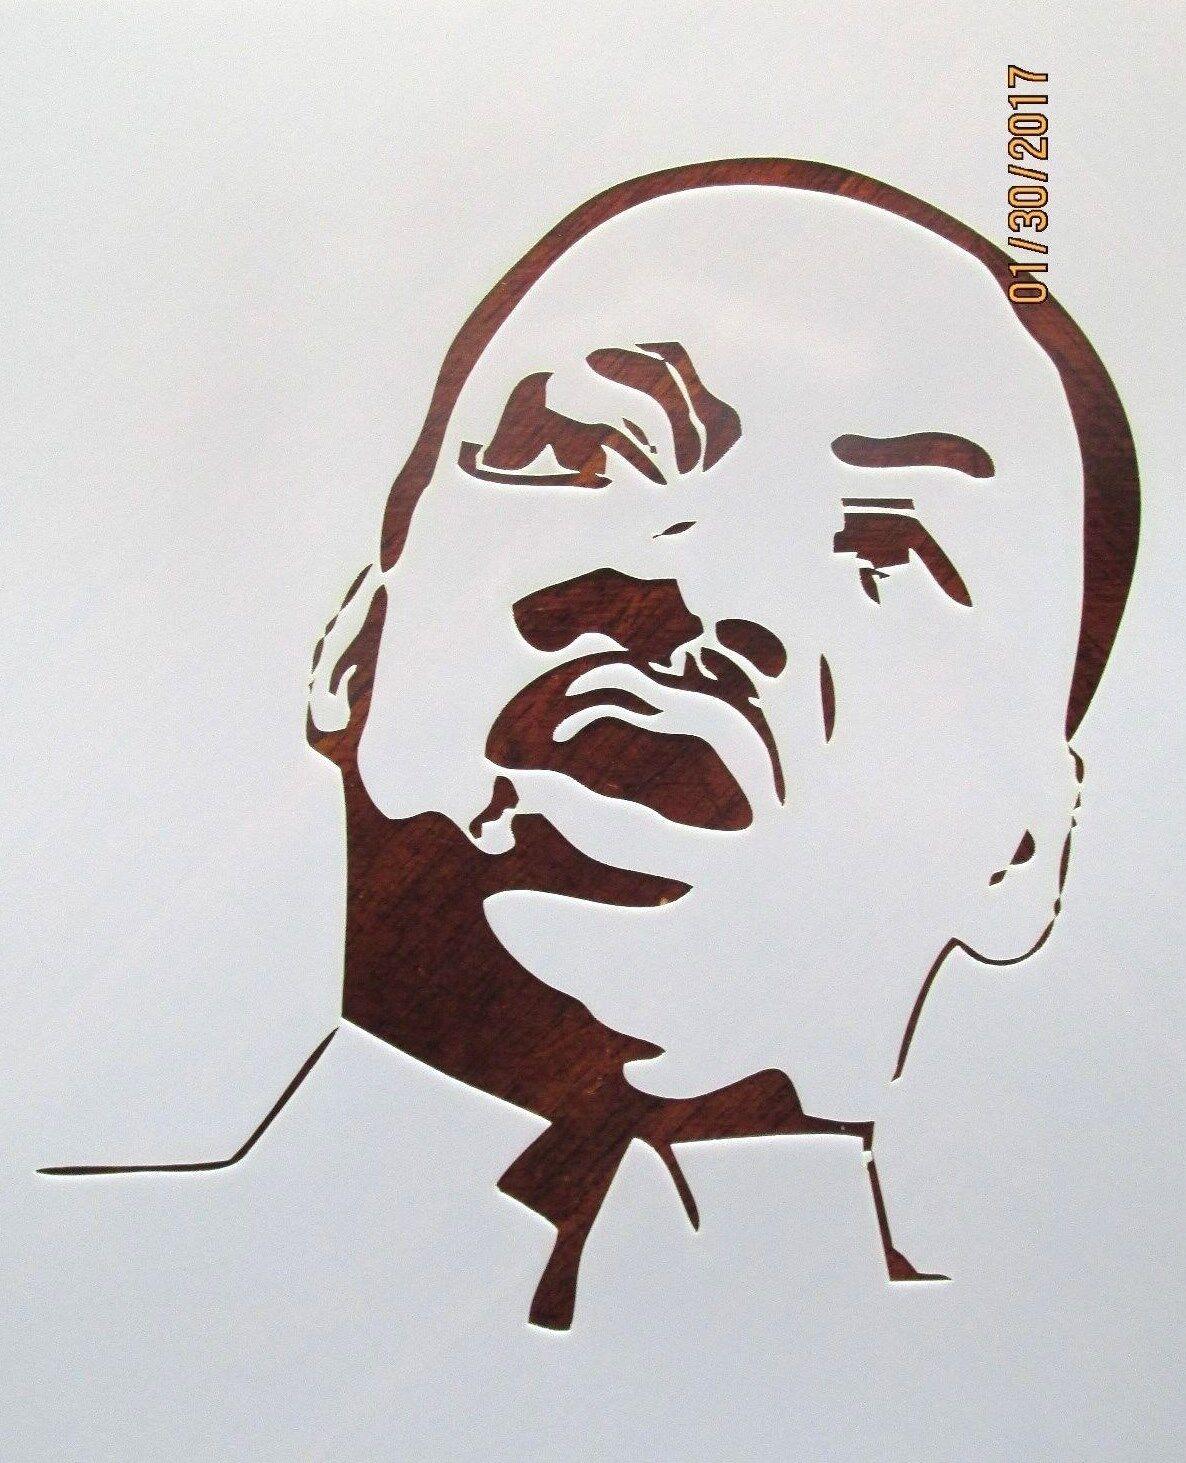 Stencil Reusable 10 mil Mylar Stencil Martin Luther King Jr